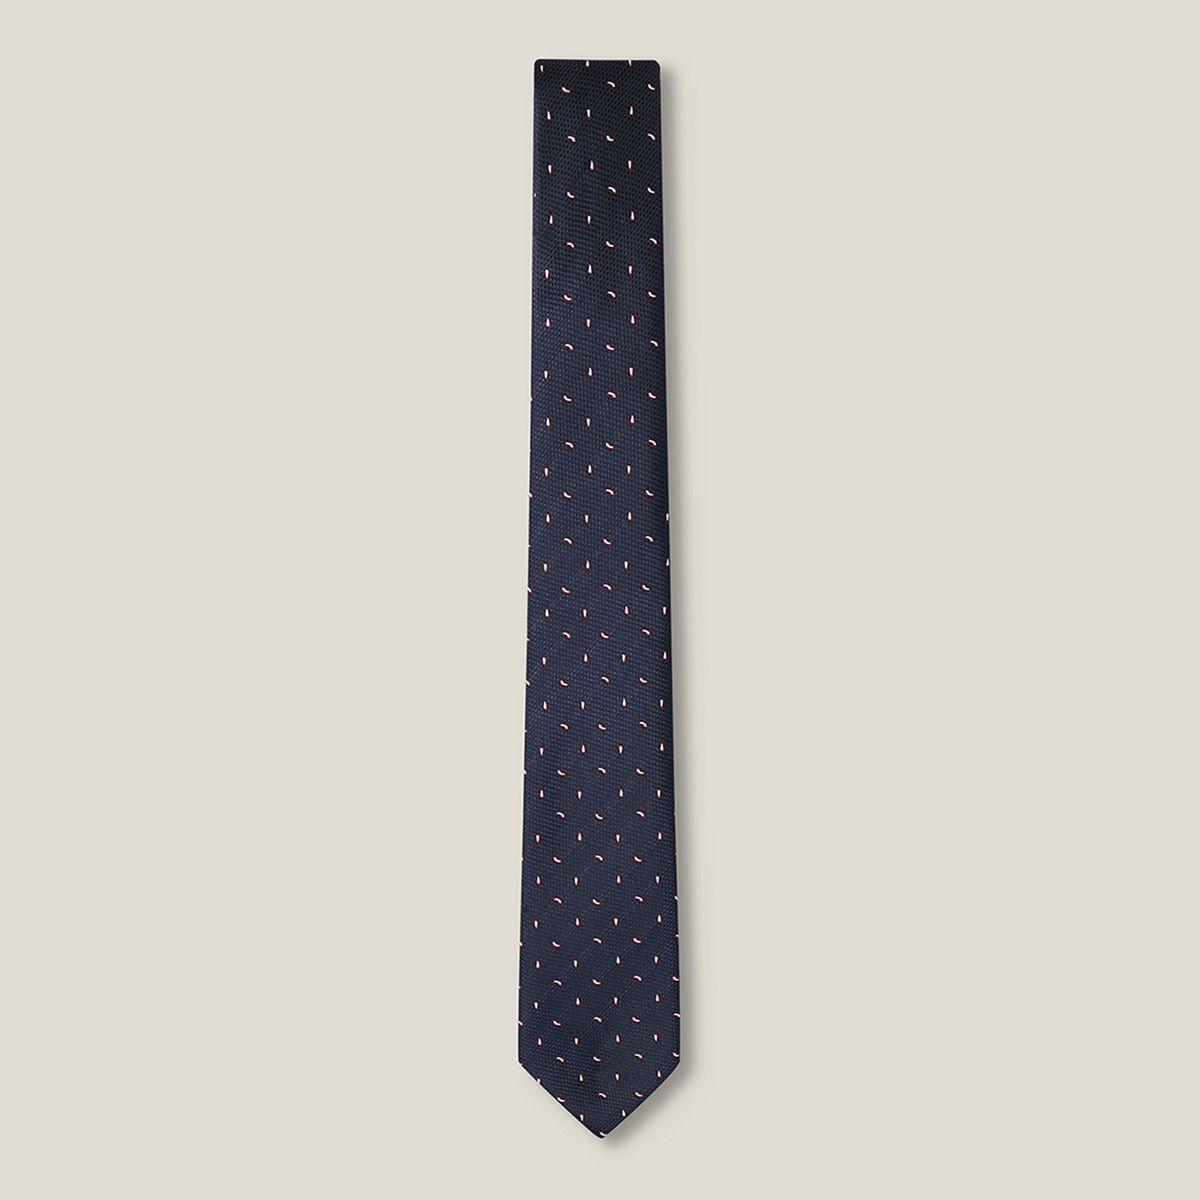 Cravate motifs cachemire